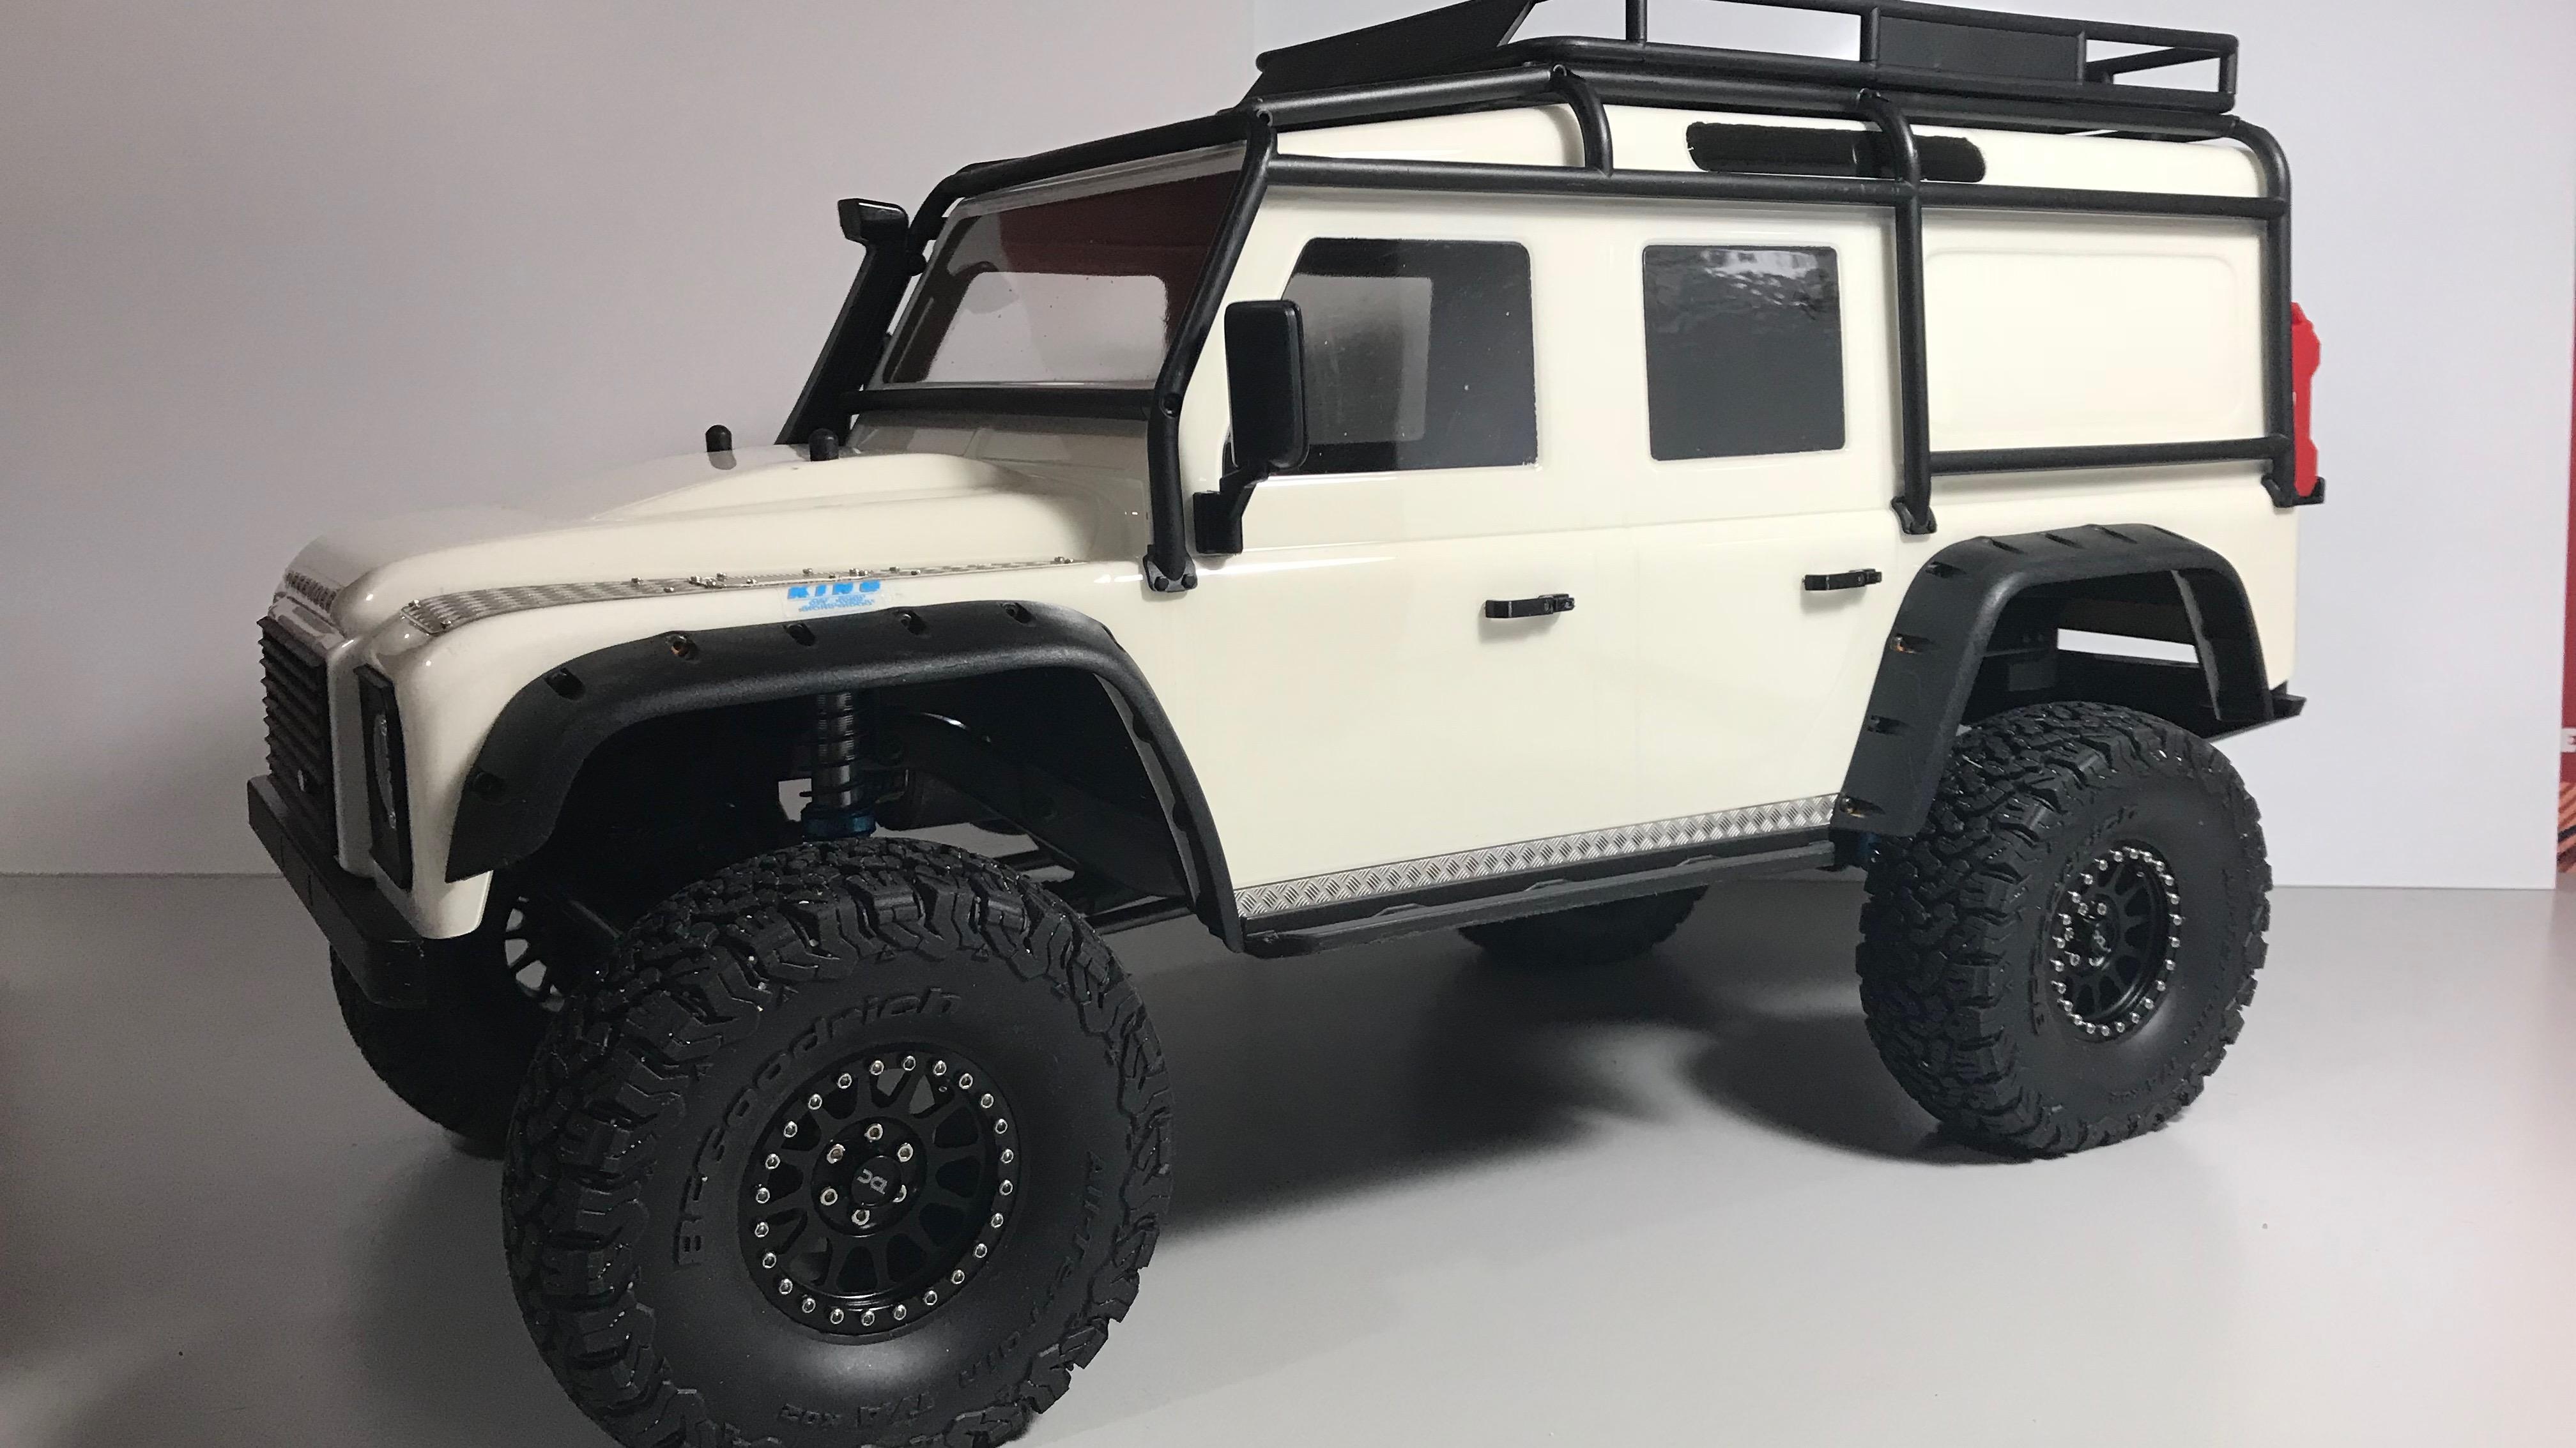 Fabrication Land Rover Pickup Defender D90 pour Léo - Page 2 7e311e7e3eeee7003d1e